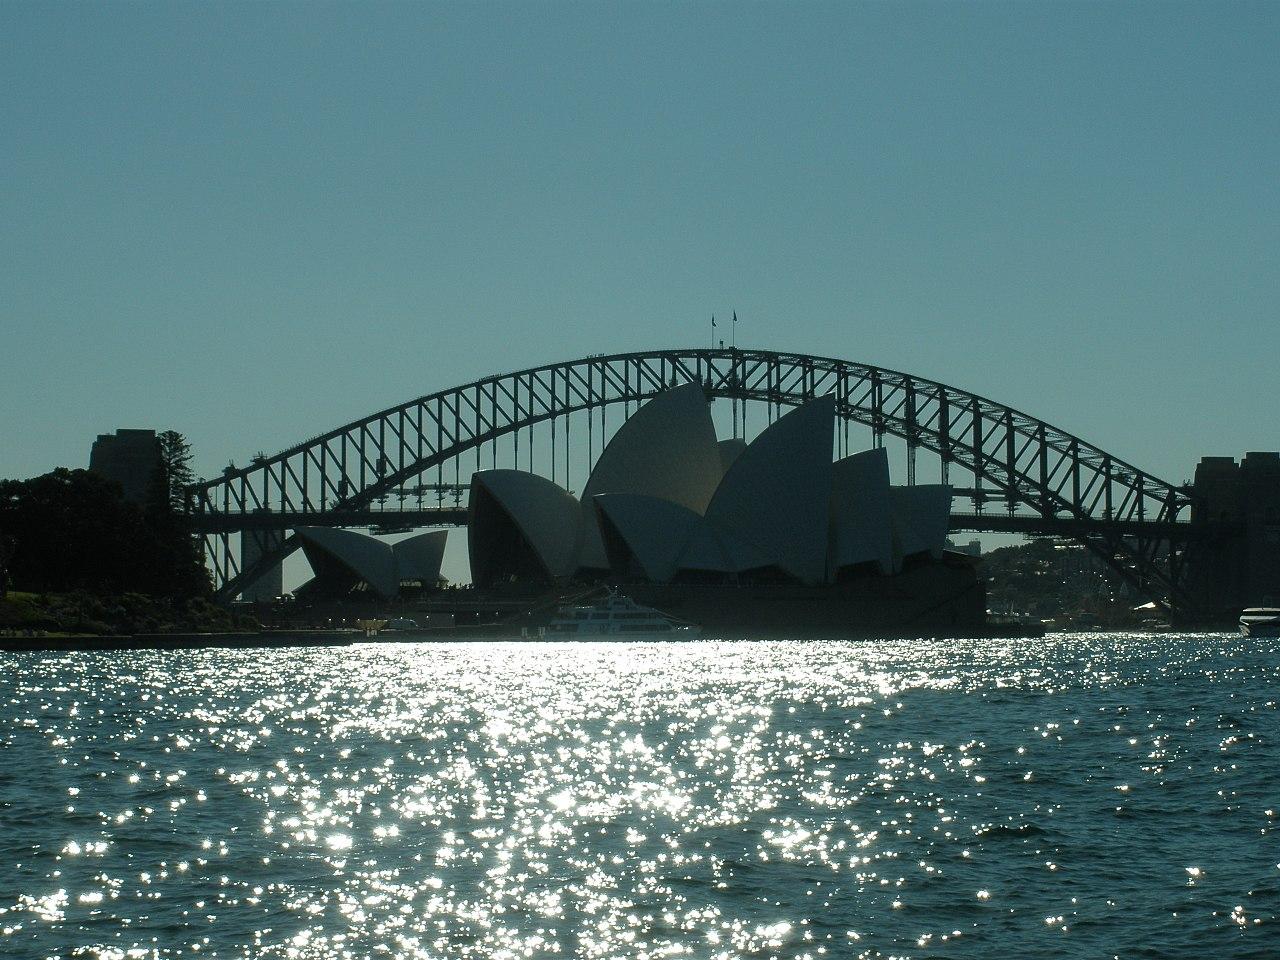 1280px-Sydney_Harbour_Bridge_with_the_Opera_House